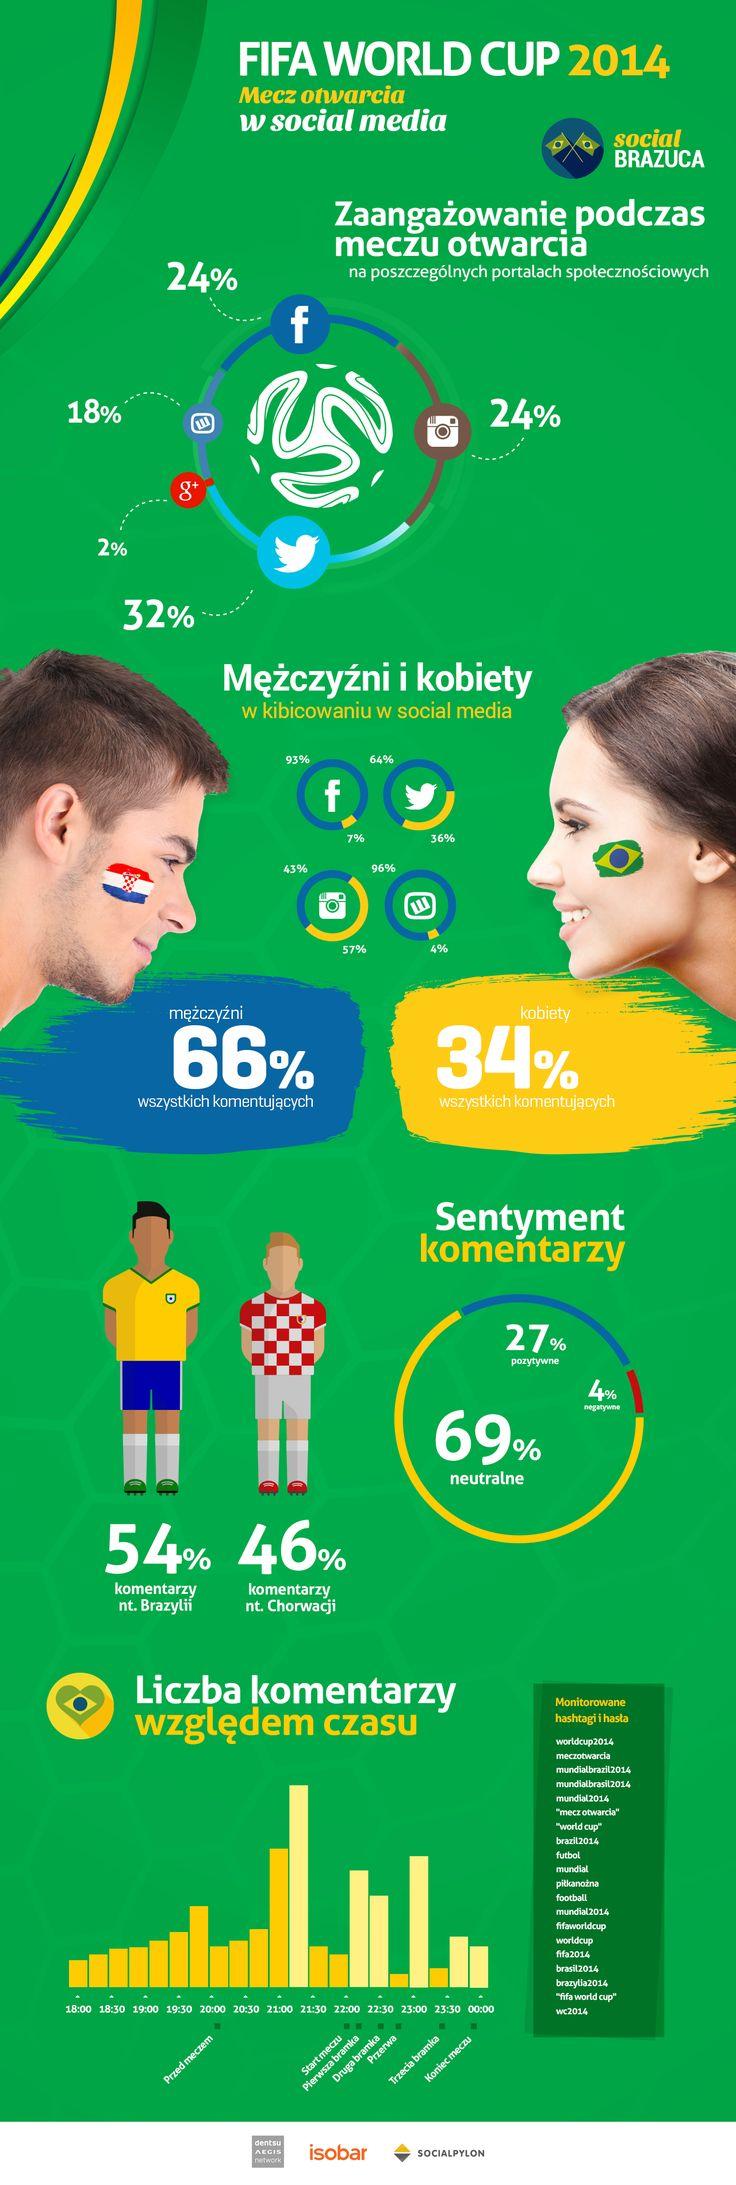 Isobar Poland o meczu otwarcia - Mundial 2014.